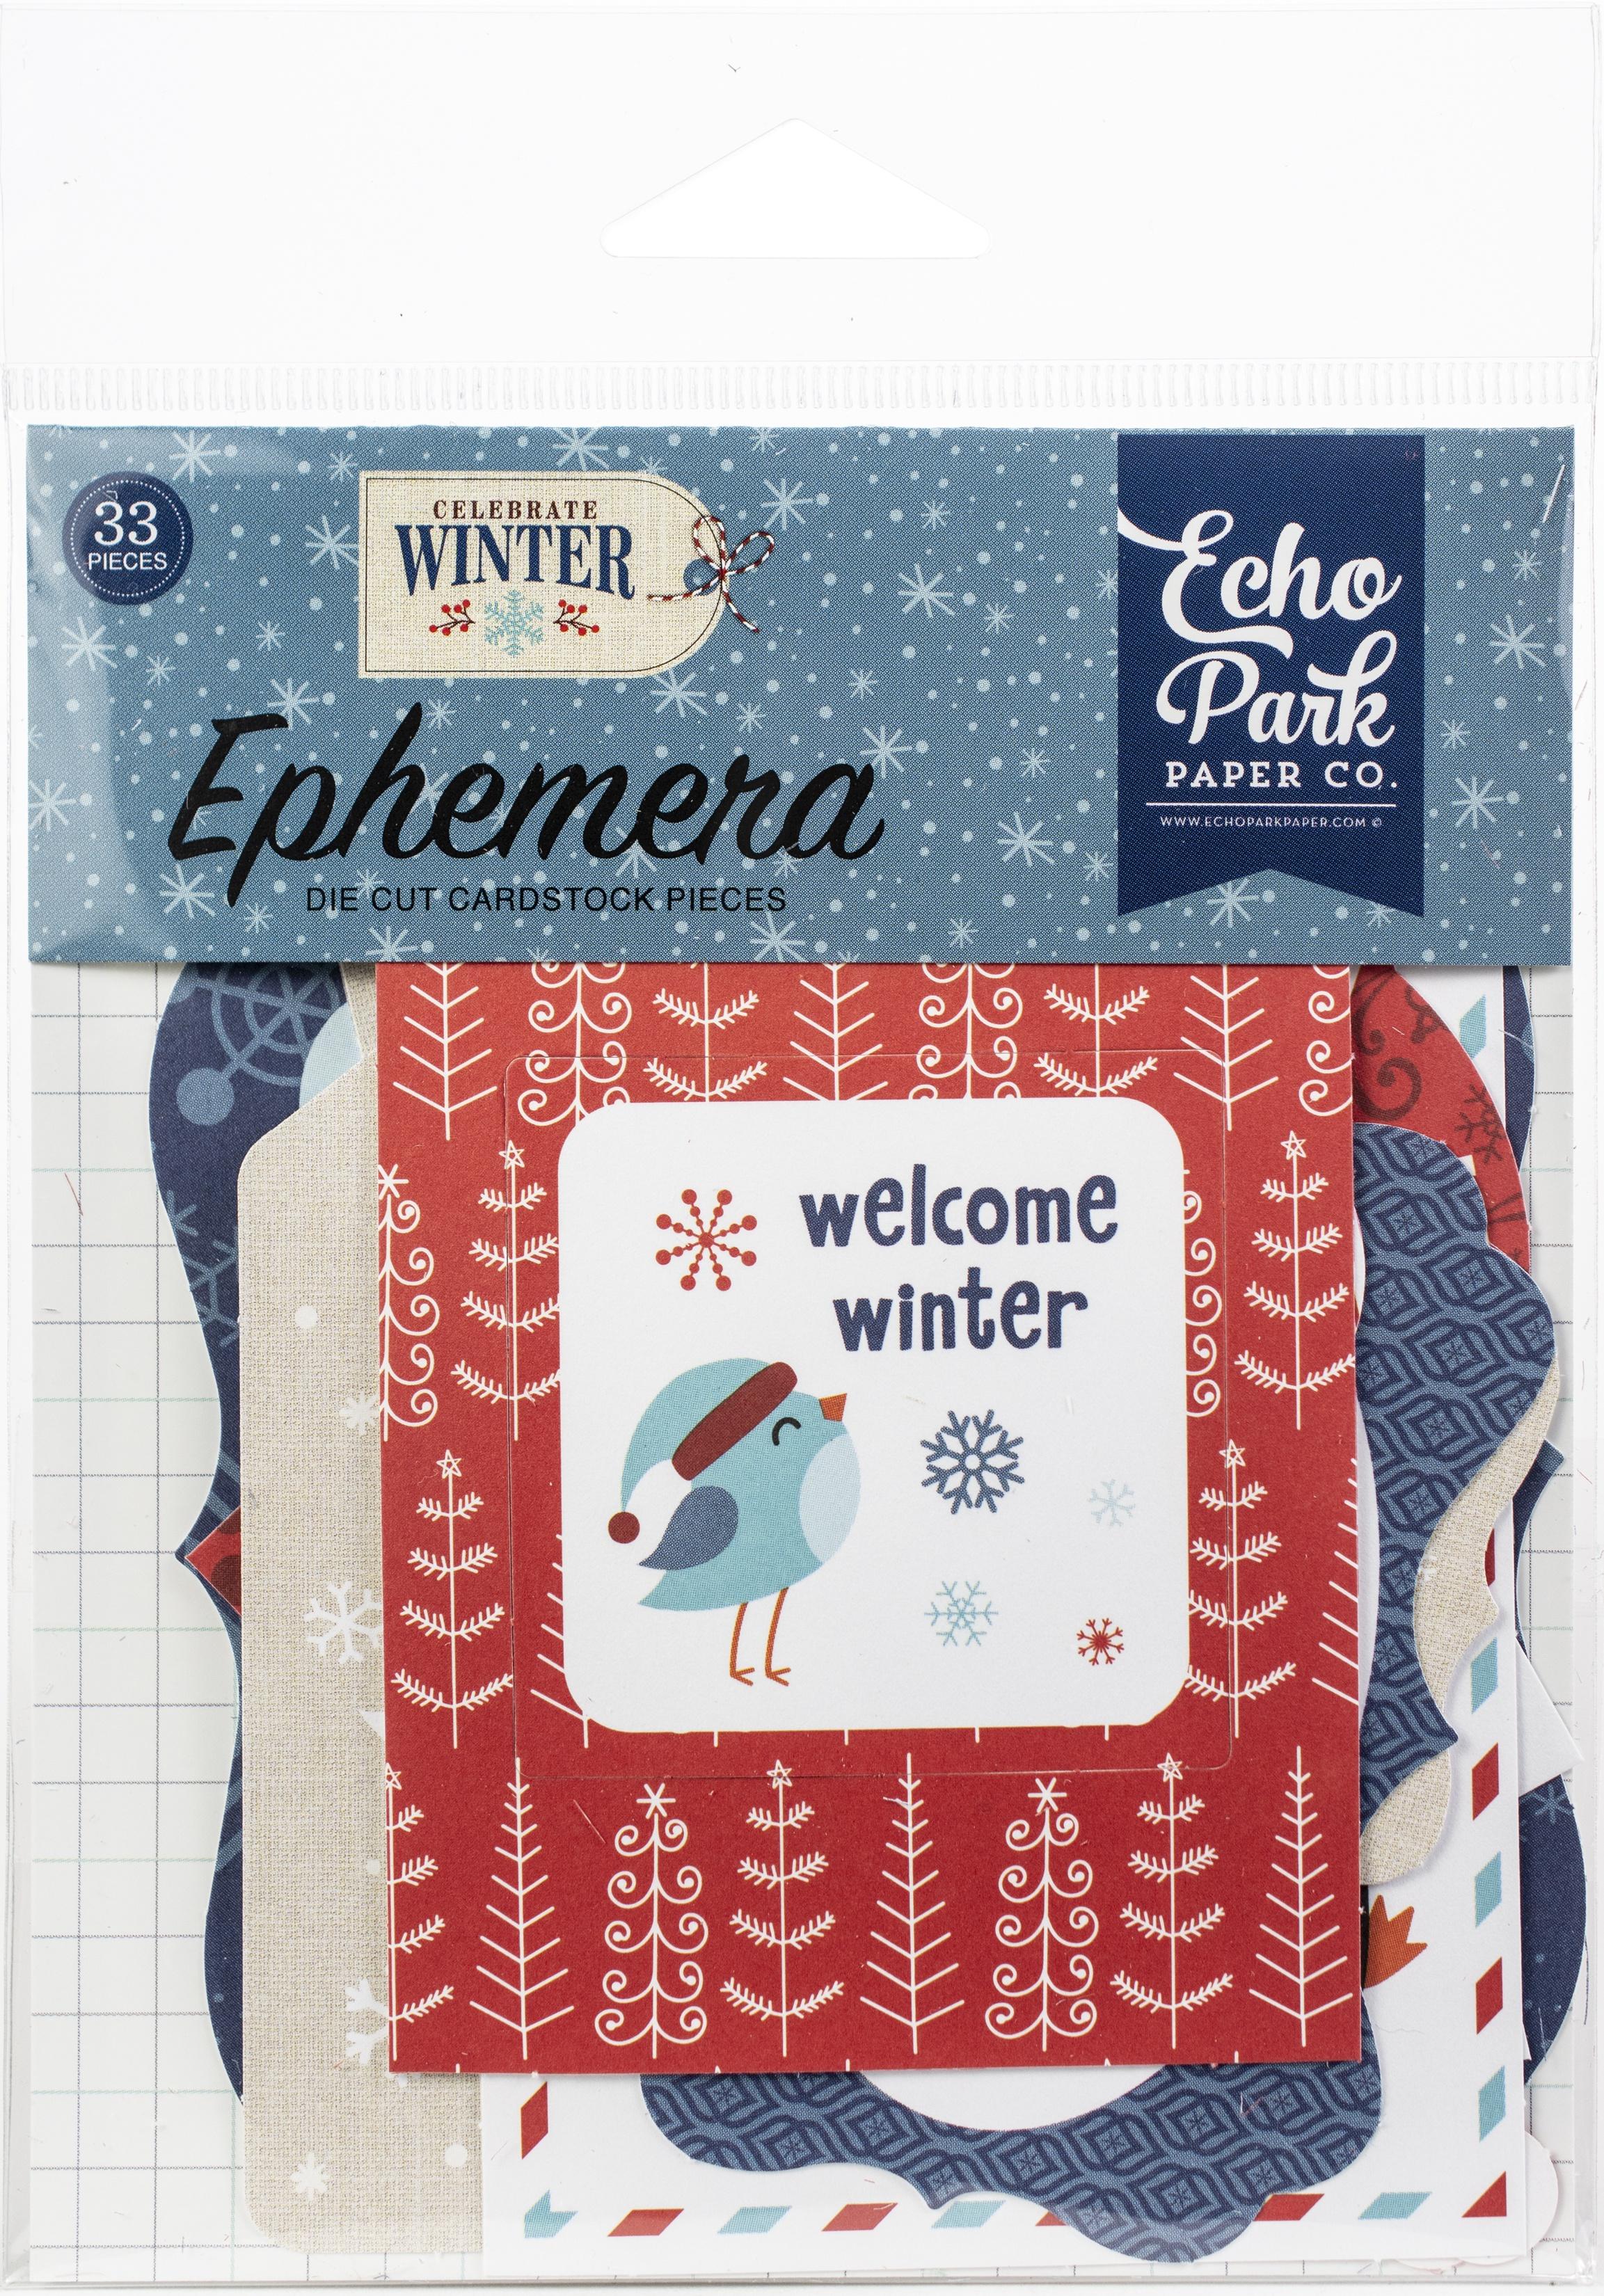 Echo Park - Celebrate Winter - Ephemera